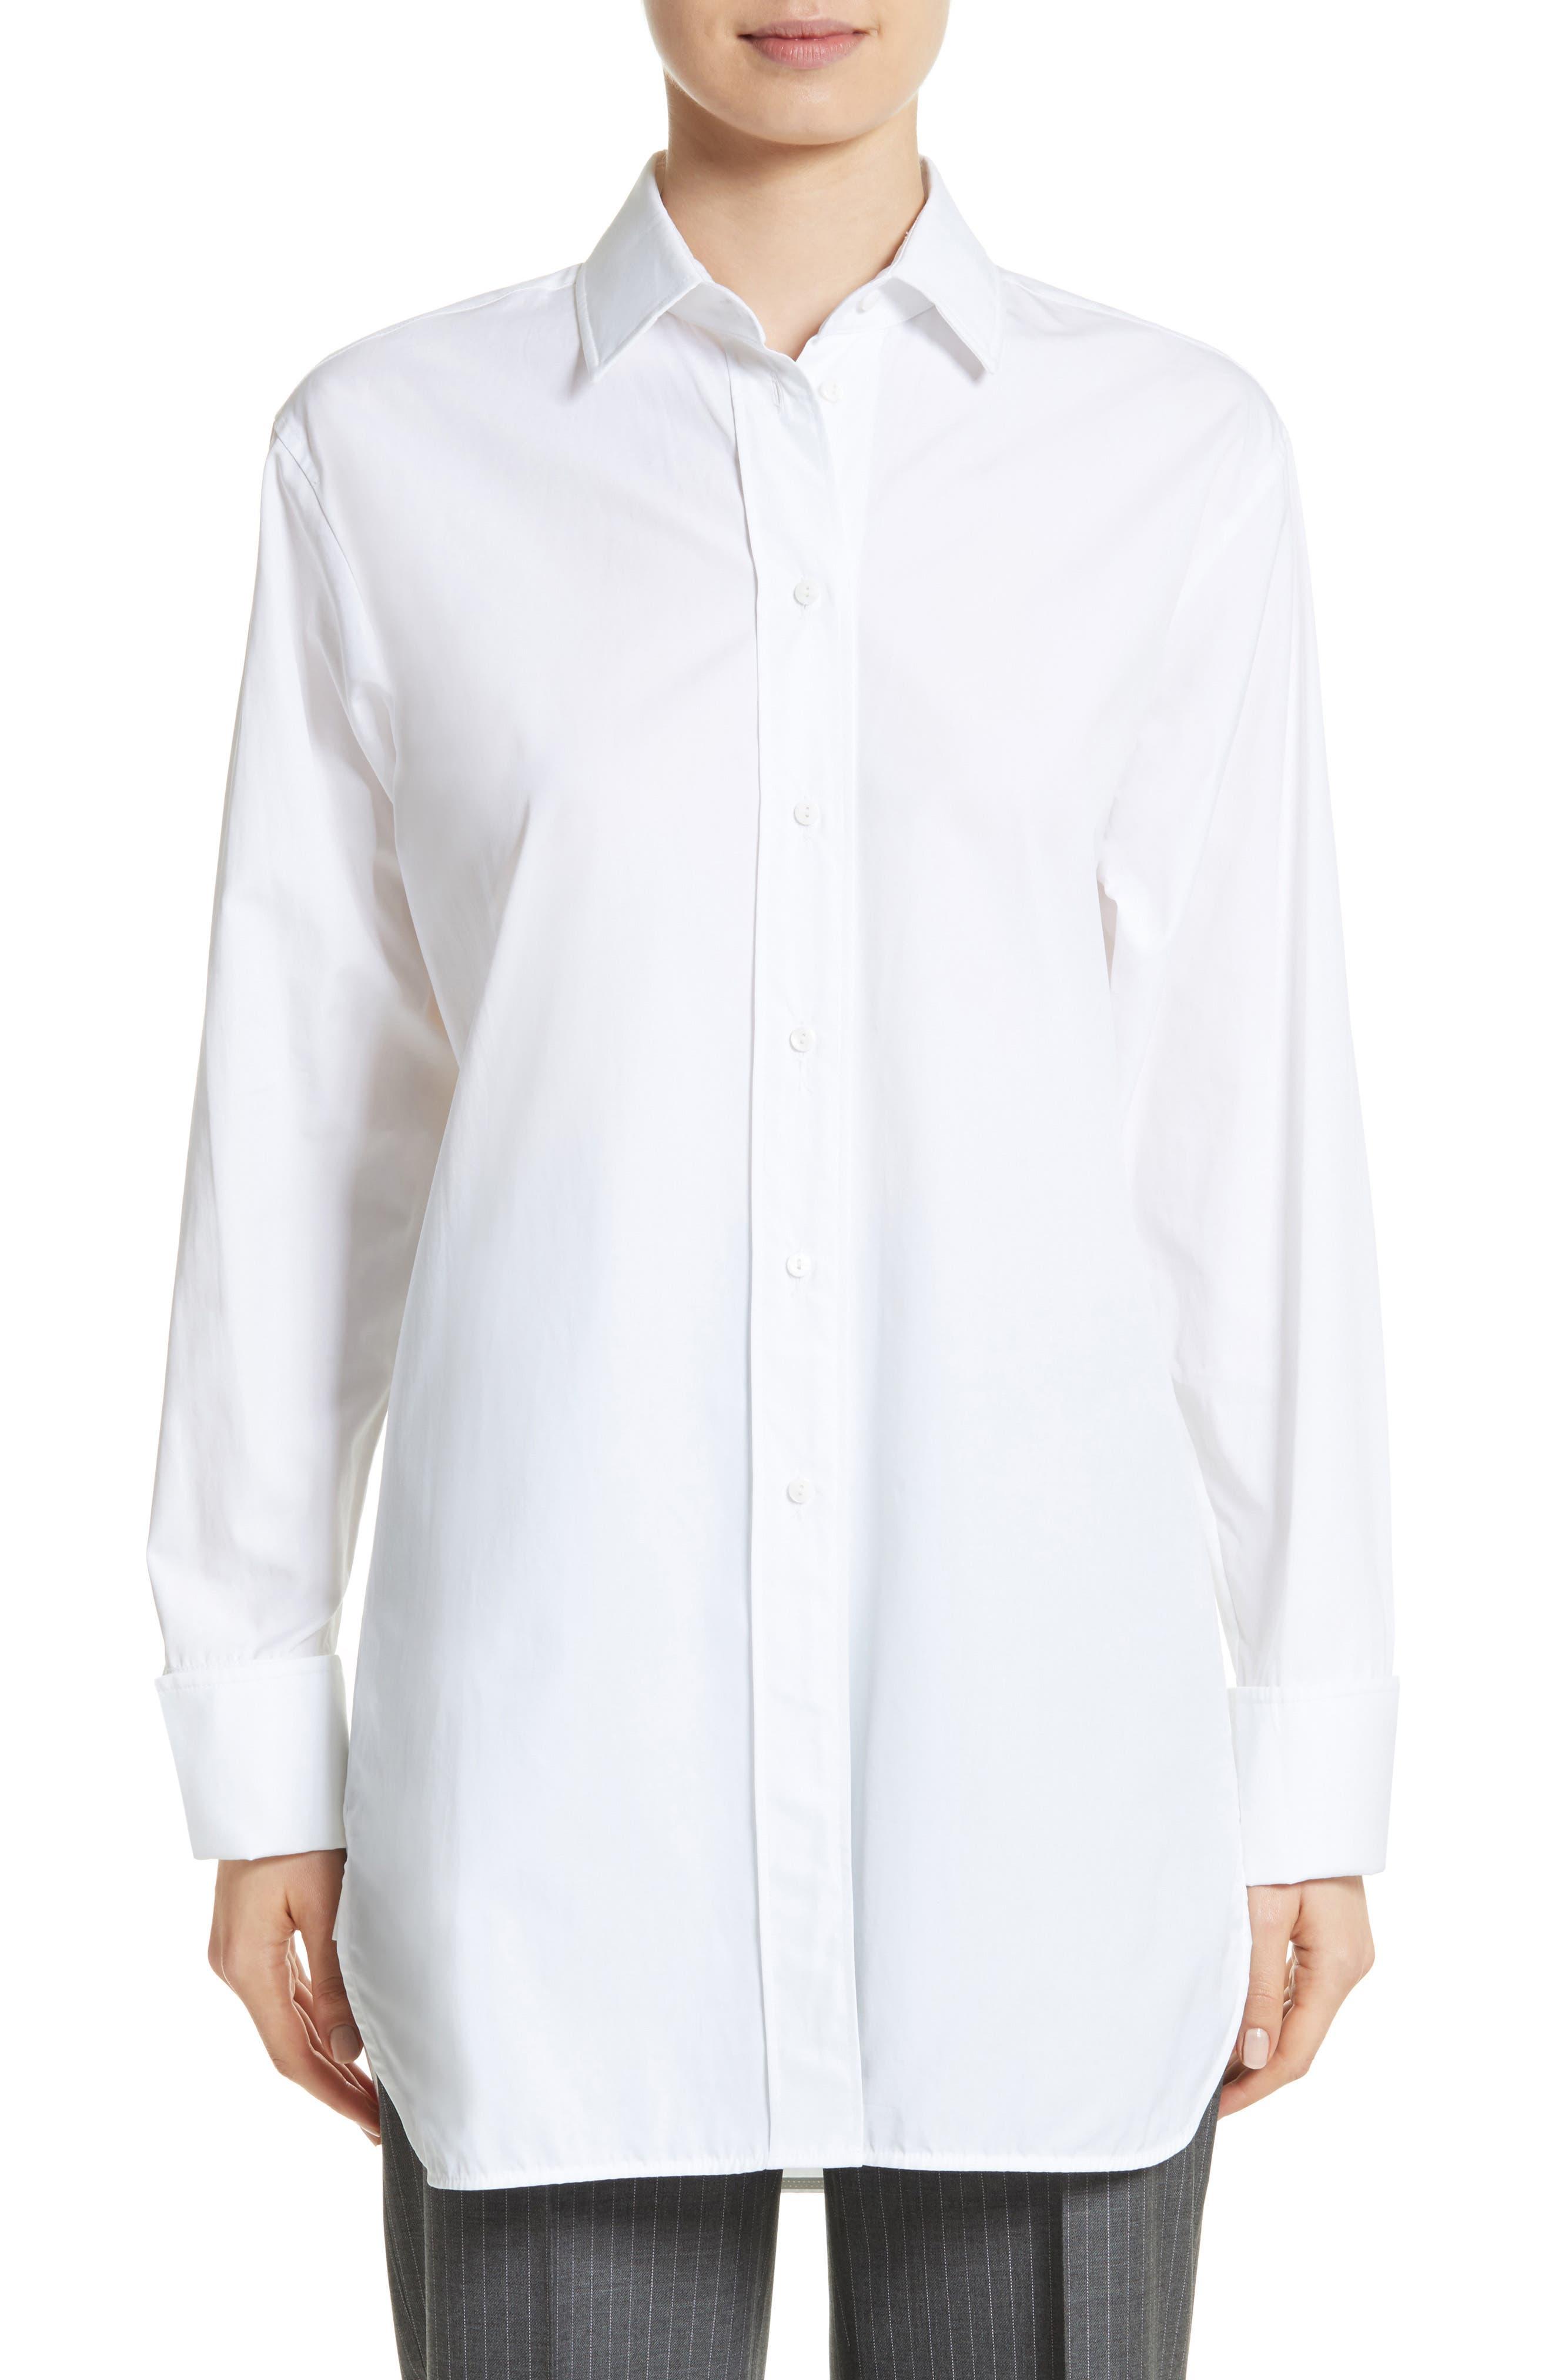 Main Image - Max Mara Visivo Cotton Poplin Shirt